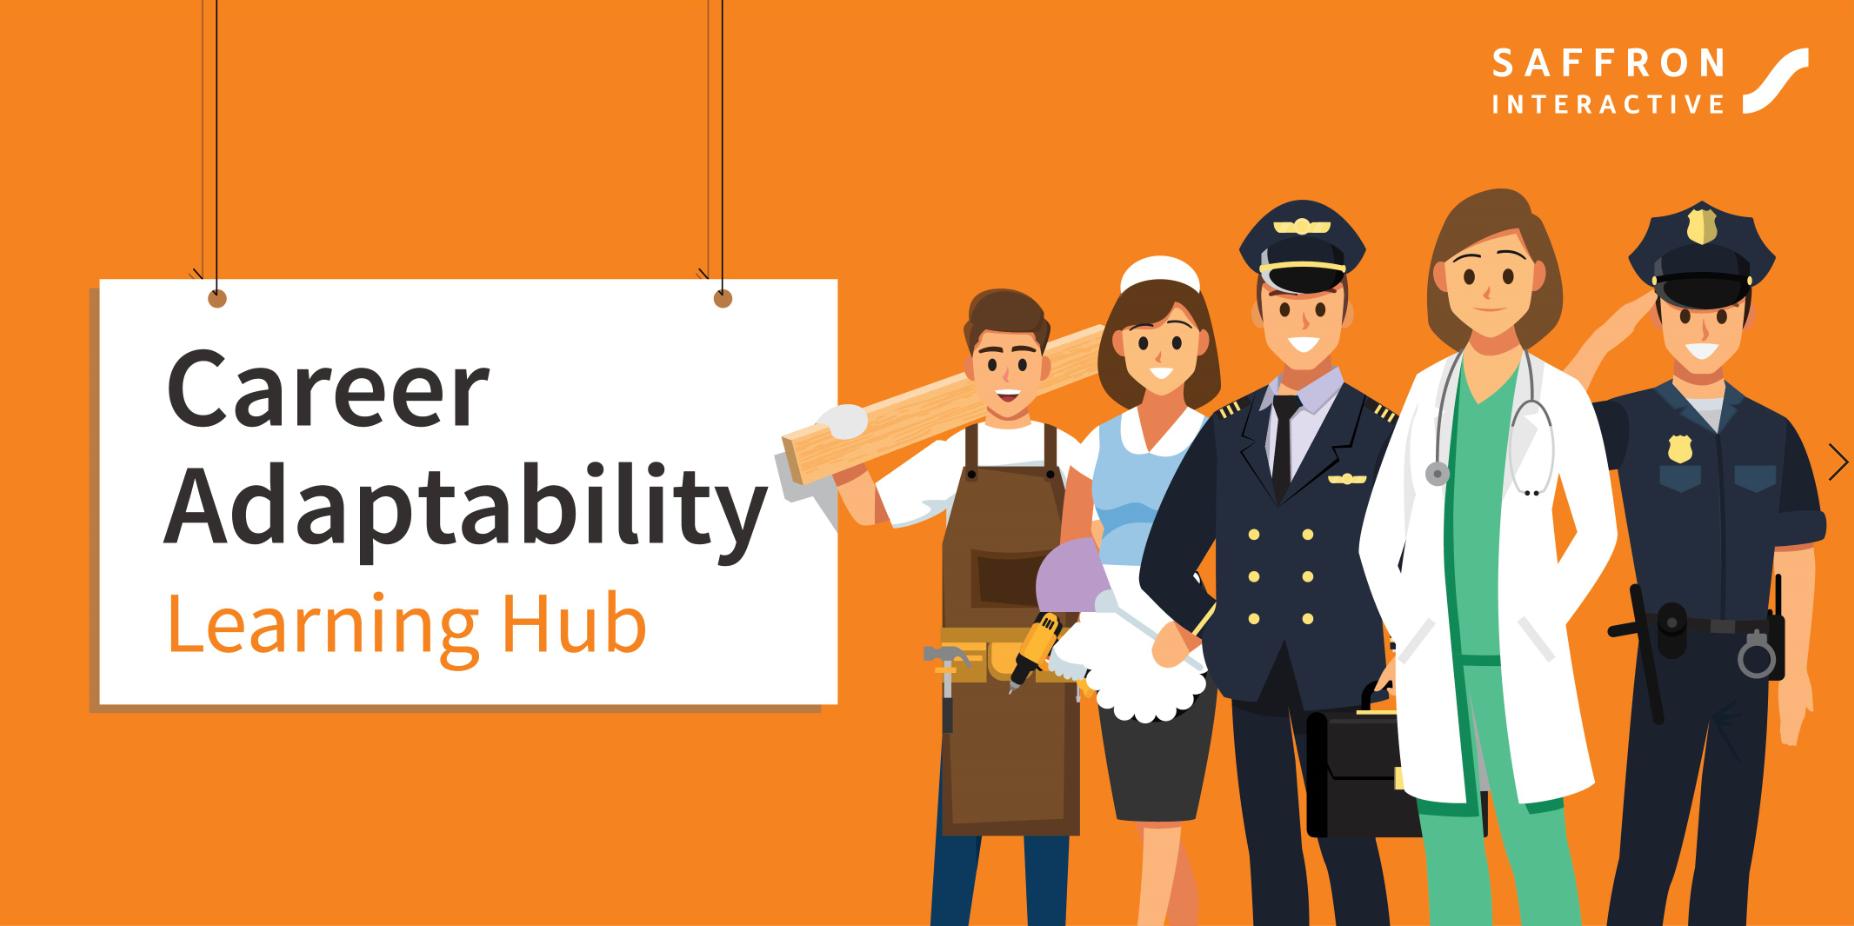 Saffron Interactive Career Adaptability Learning Hub